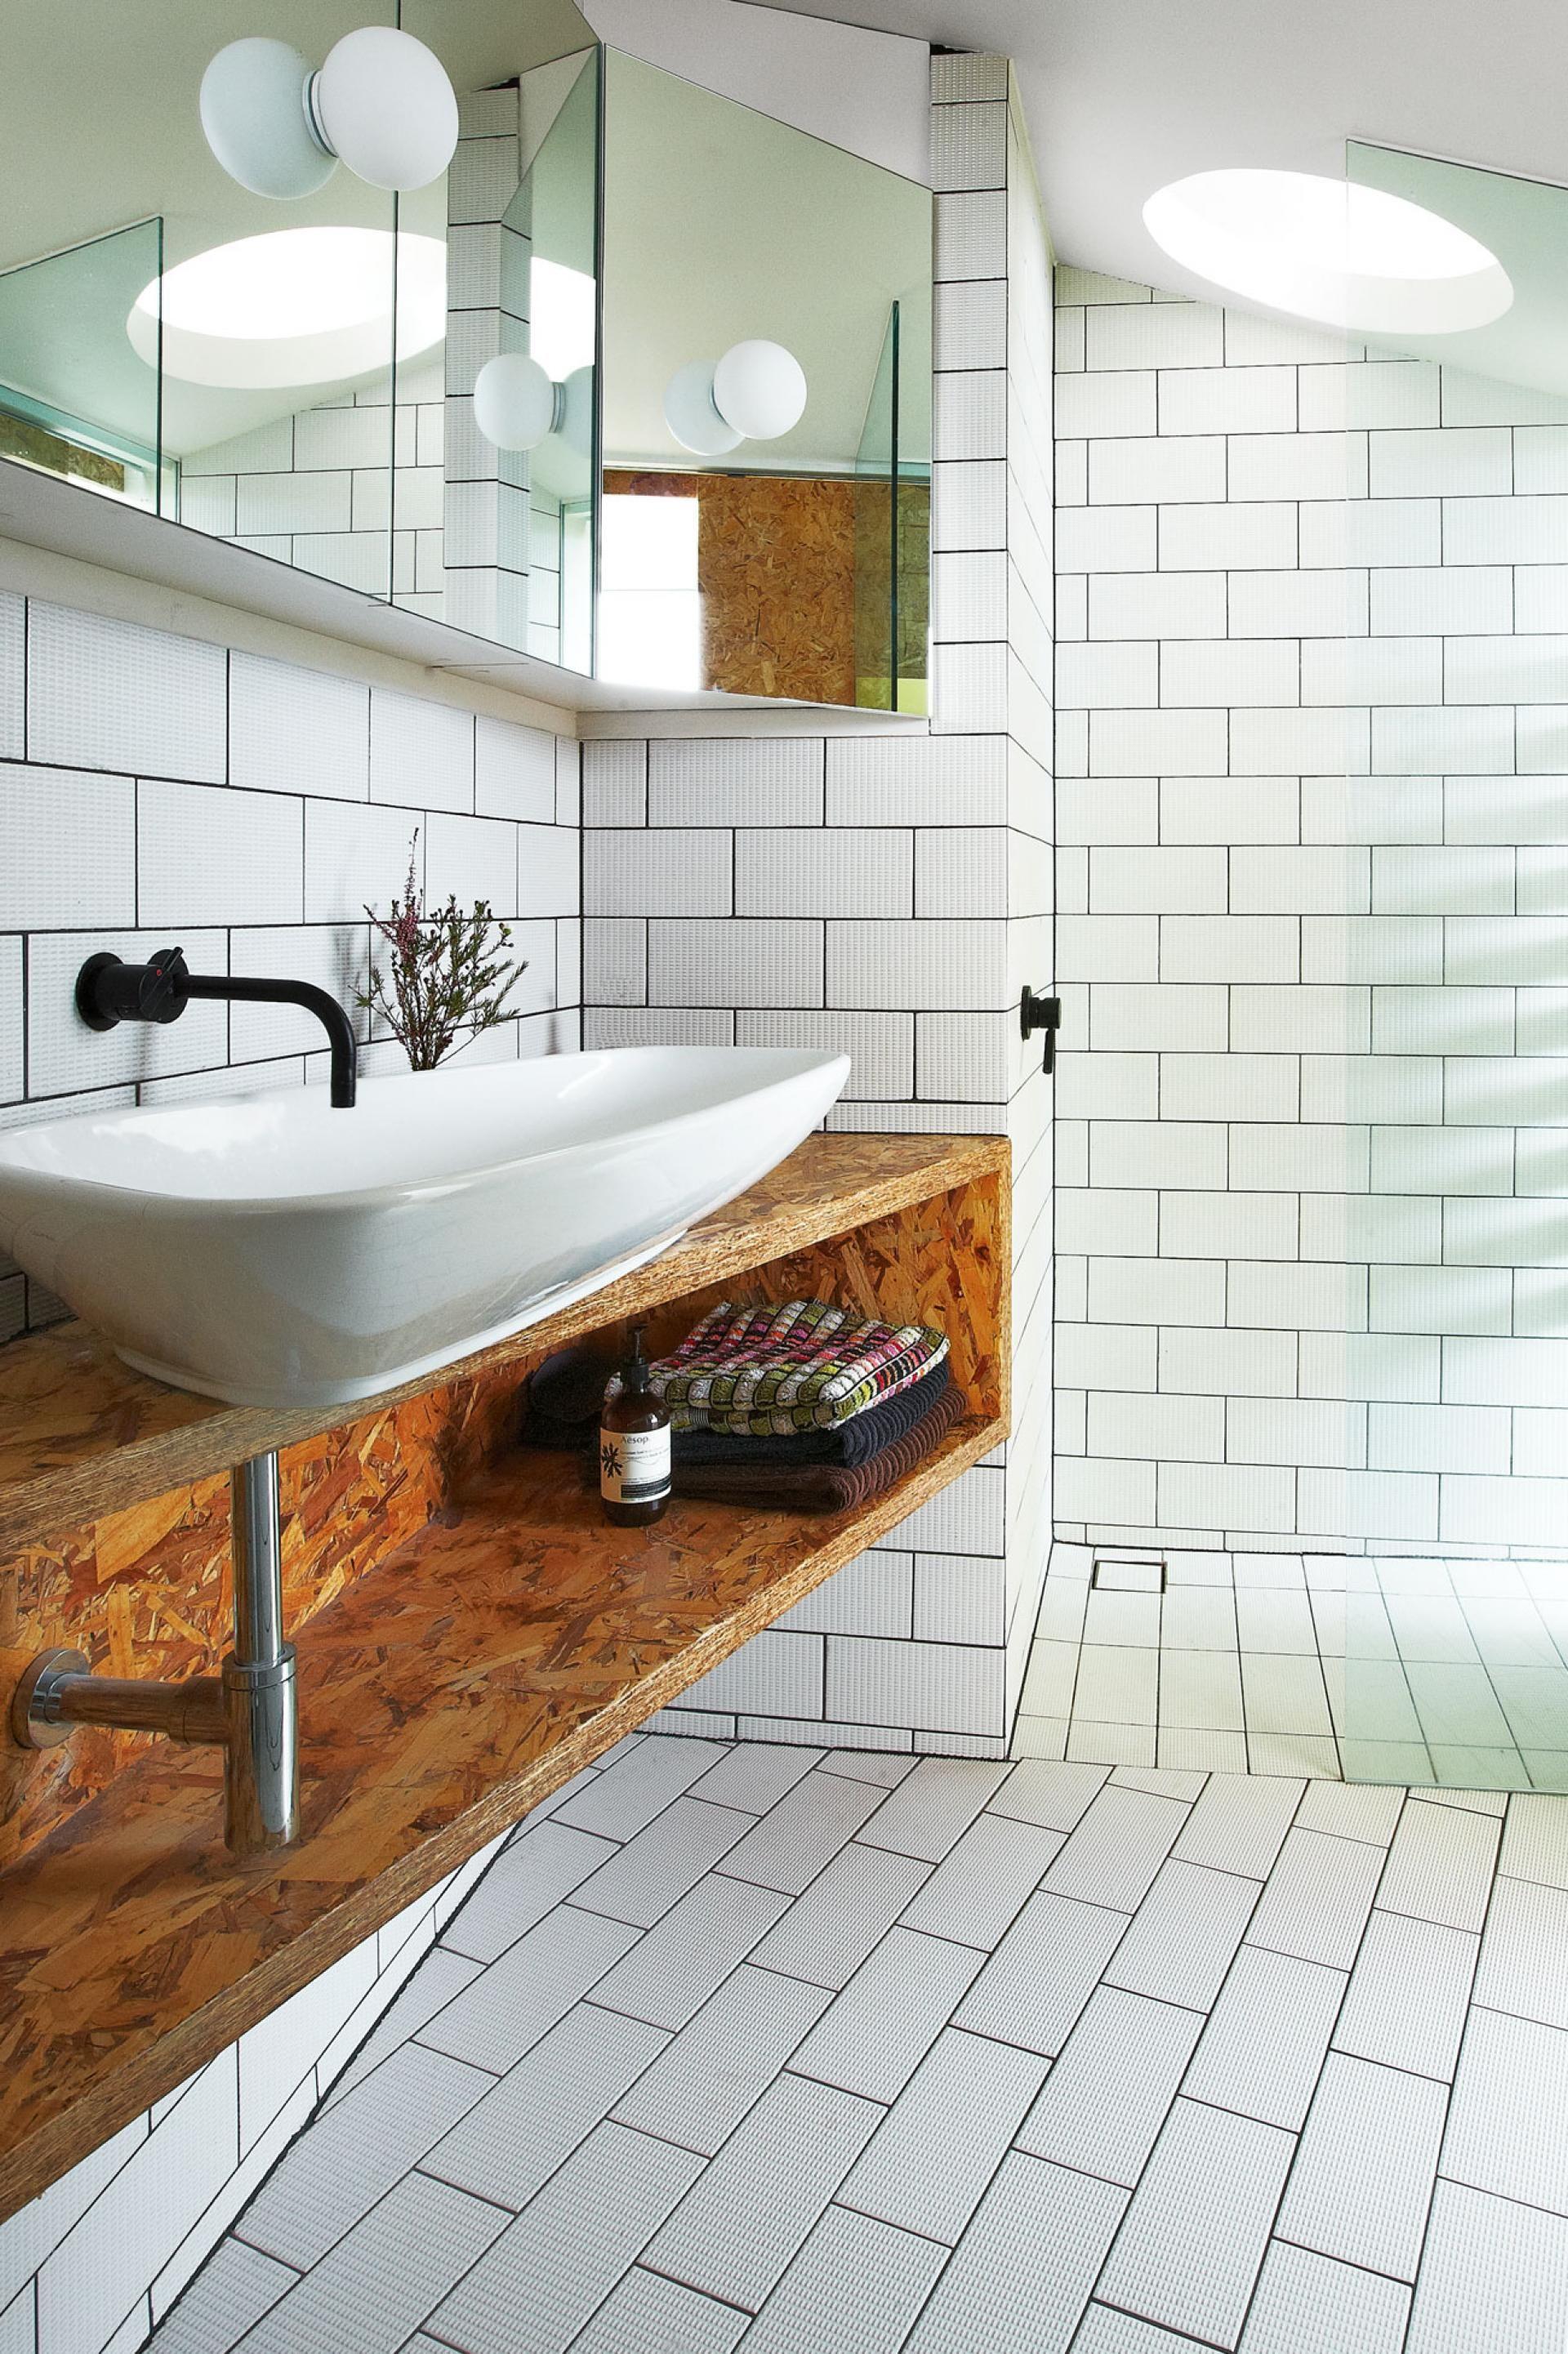 edwards-bathroom-OSB  Carrelage salle de bain, Travaux salle de